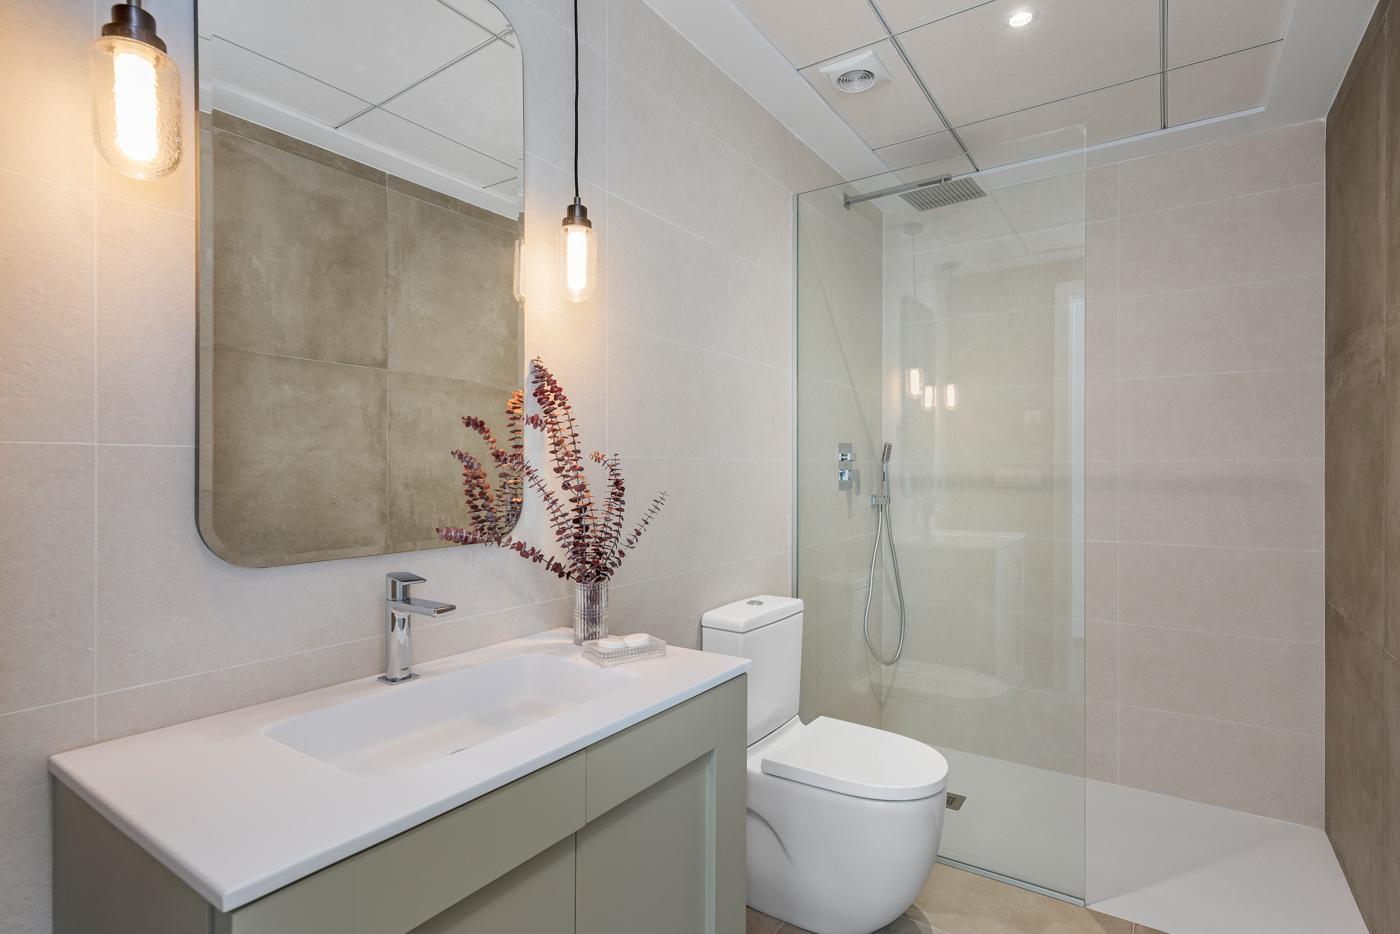 39 - Paris V - First floor Bathroom